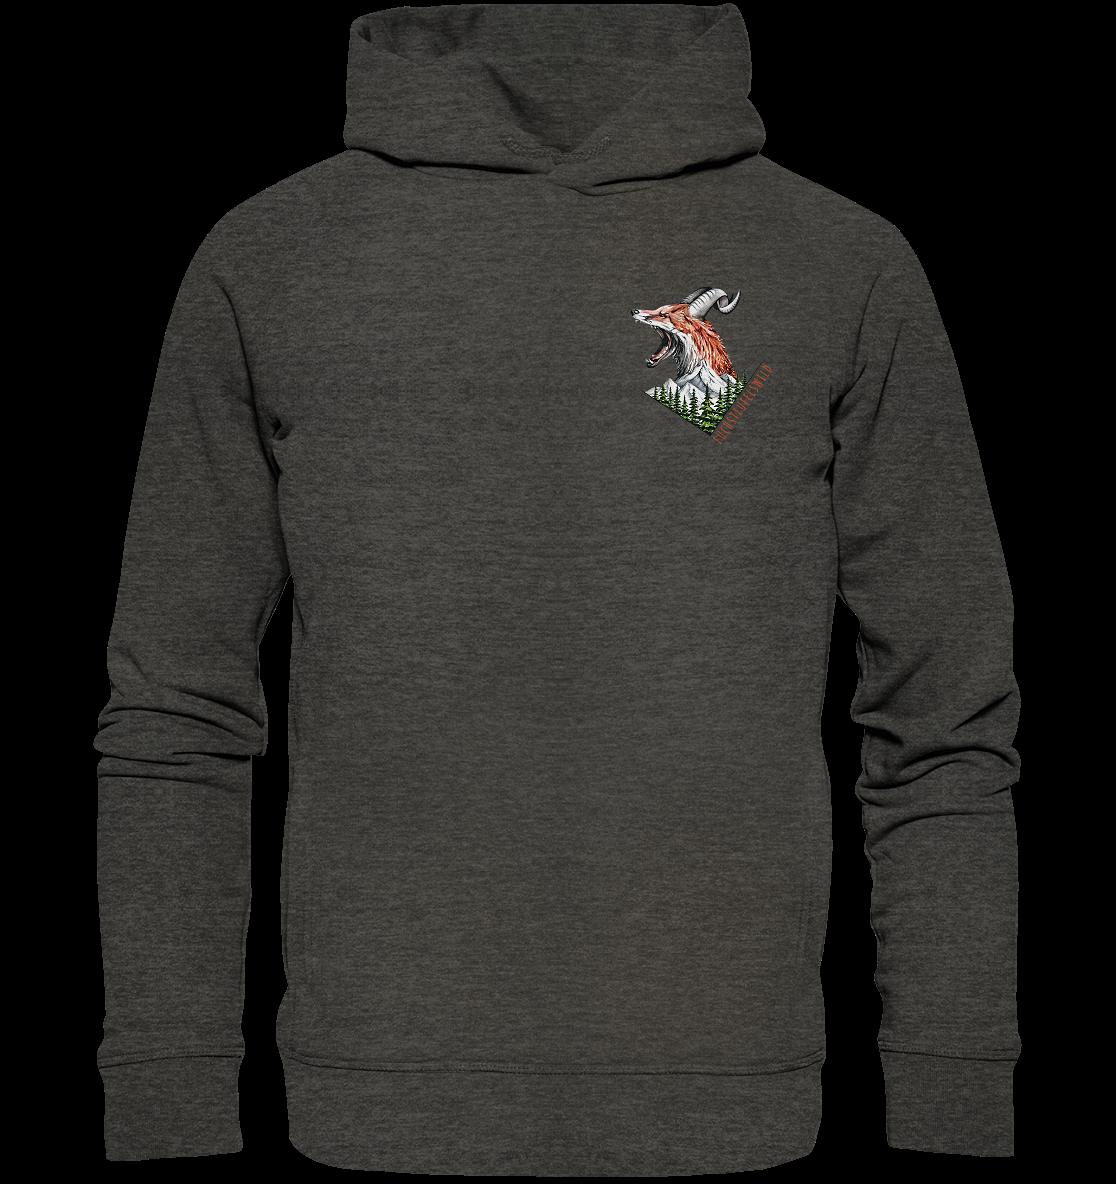 front-organic-fashion-hoodie-252625-1116x-1.png